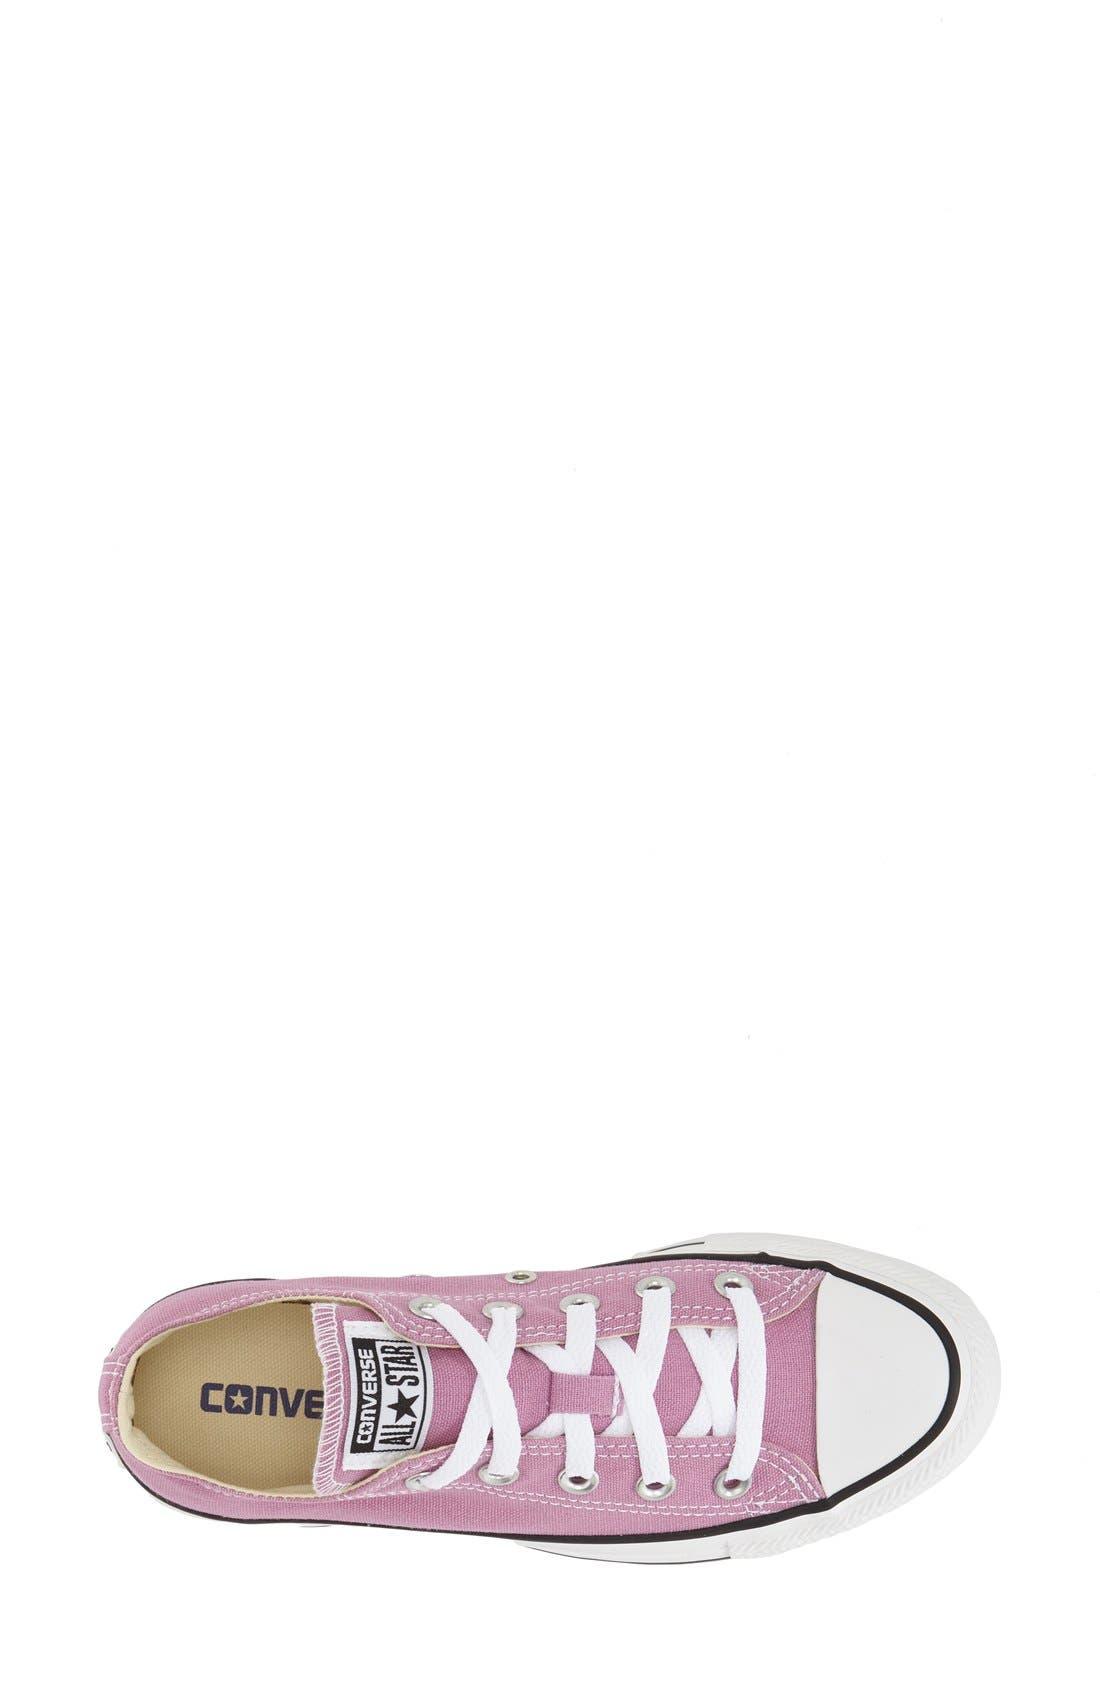 Alternate Image 3  - Converse Chuck Taylor® All Star® 'Ox' Low Top Sneaker (Women)